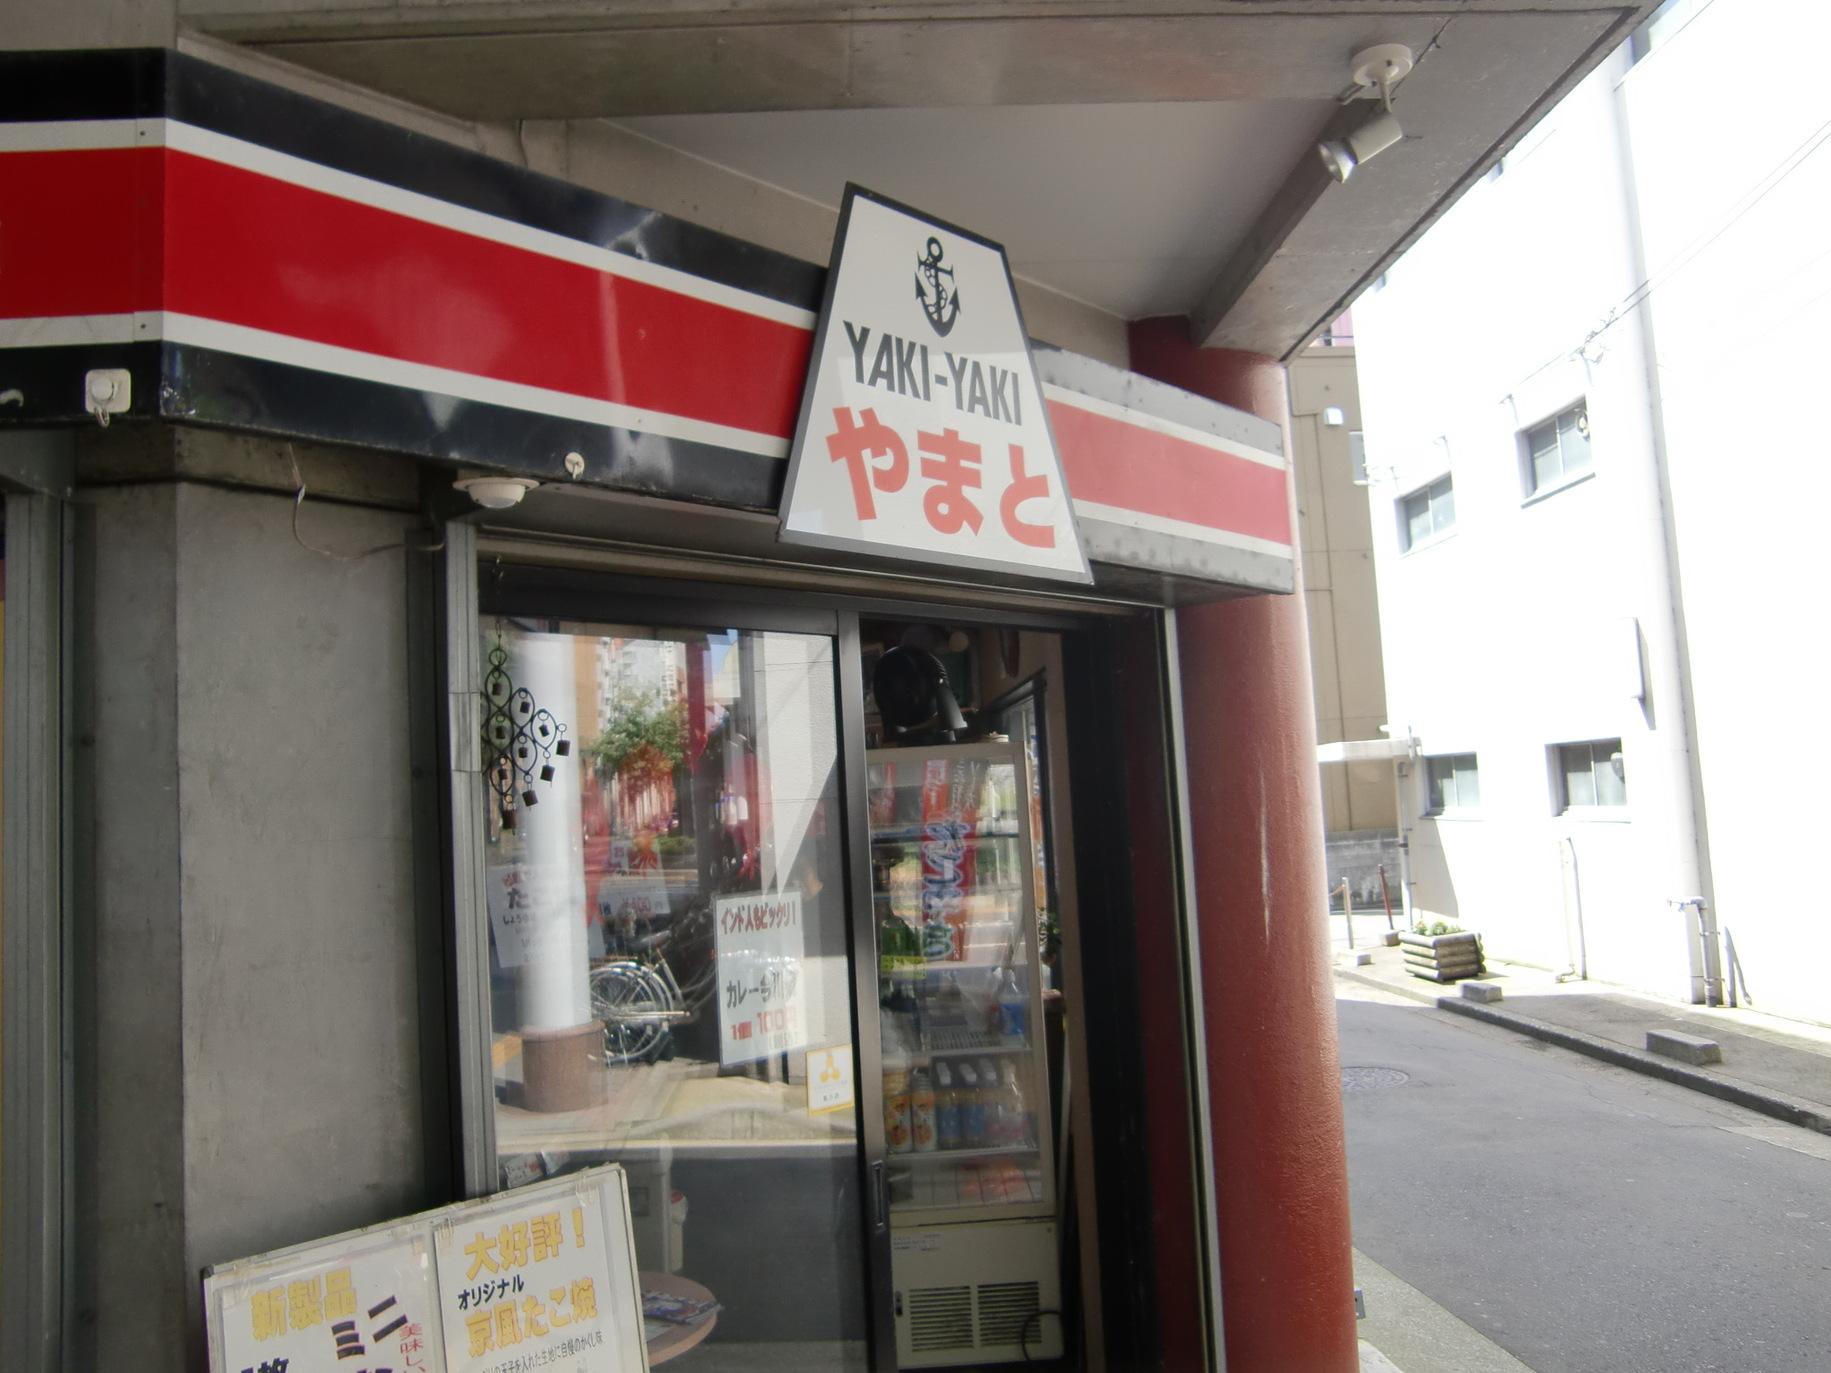 YAKIYAKIやまと 長岡駅前店